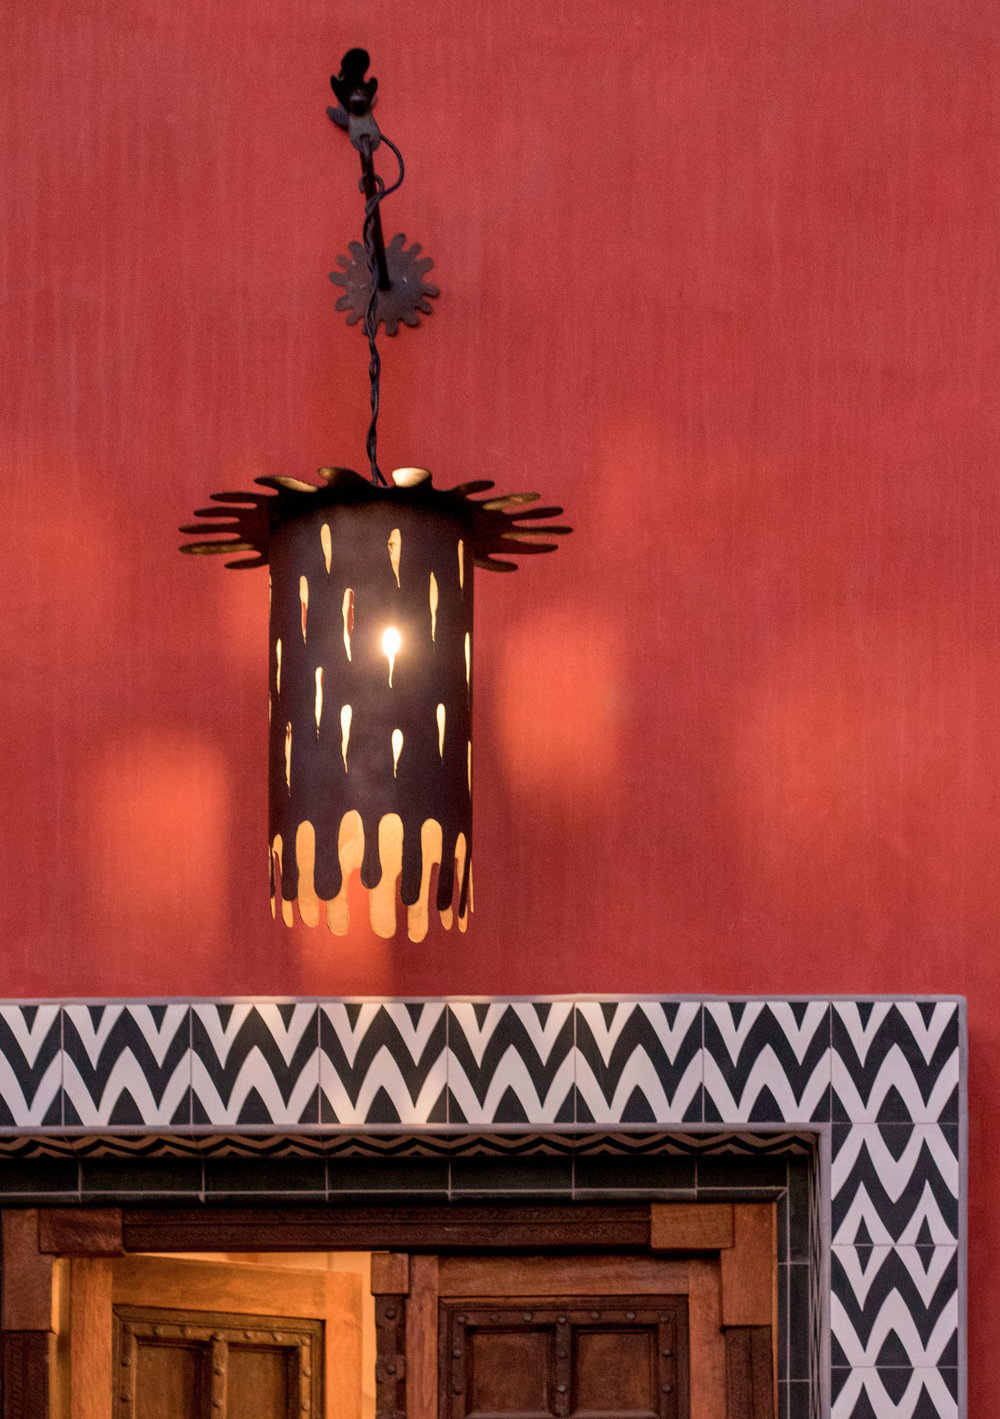 Jeff Shelton designer, Casa Africana. Lantena etnica design esterni